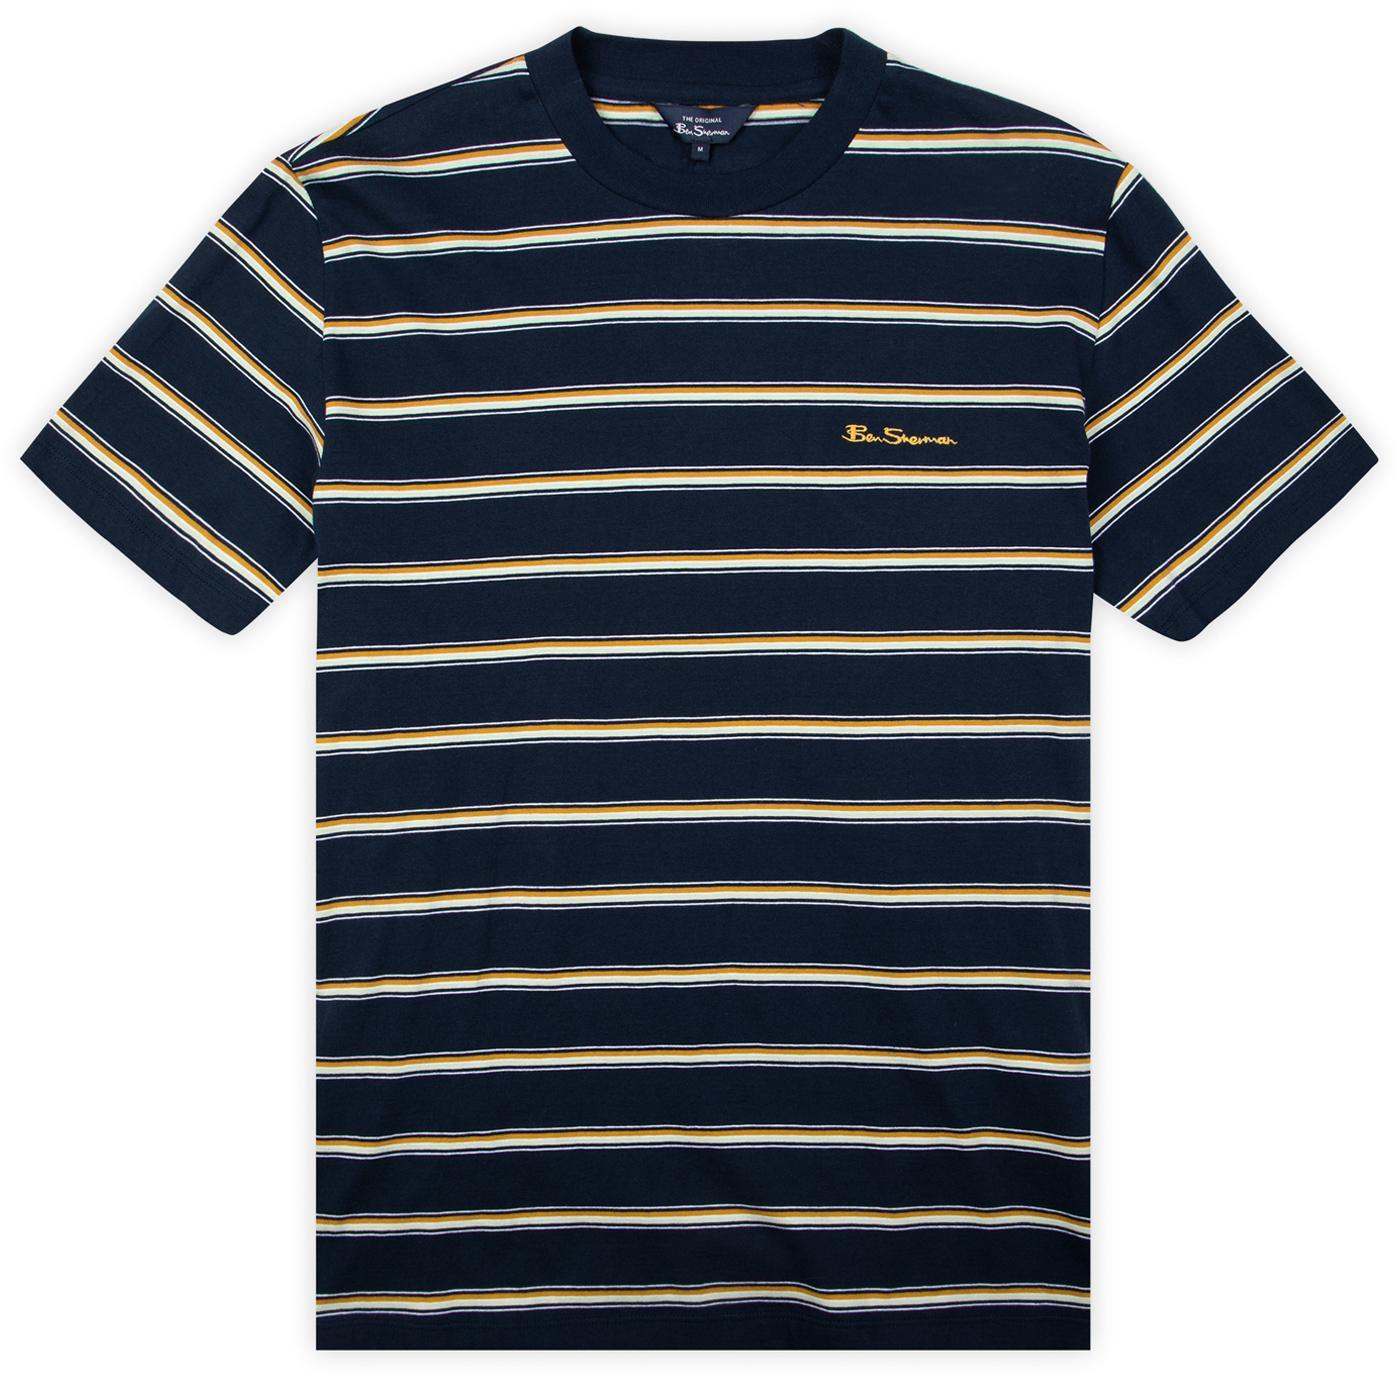 BEN SHERMAN Vintage Yarn Dye Mod Stripe Tee (Navy)